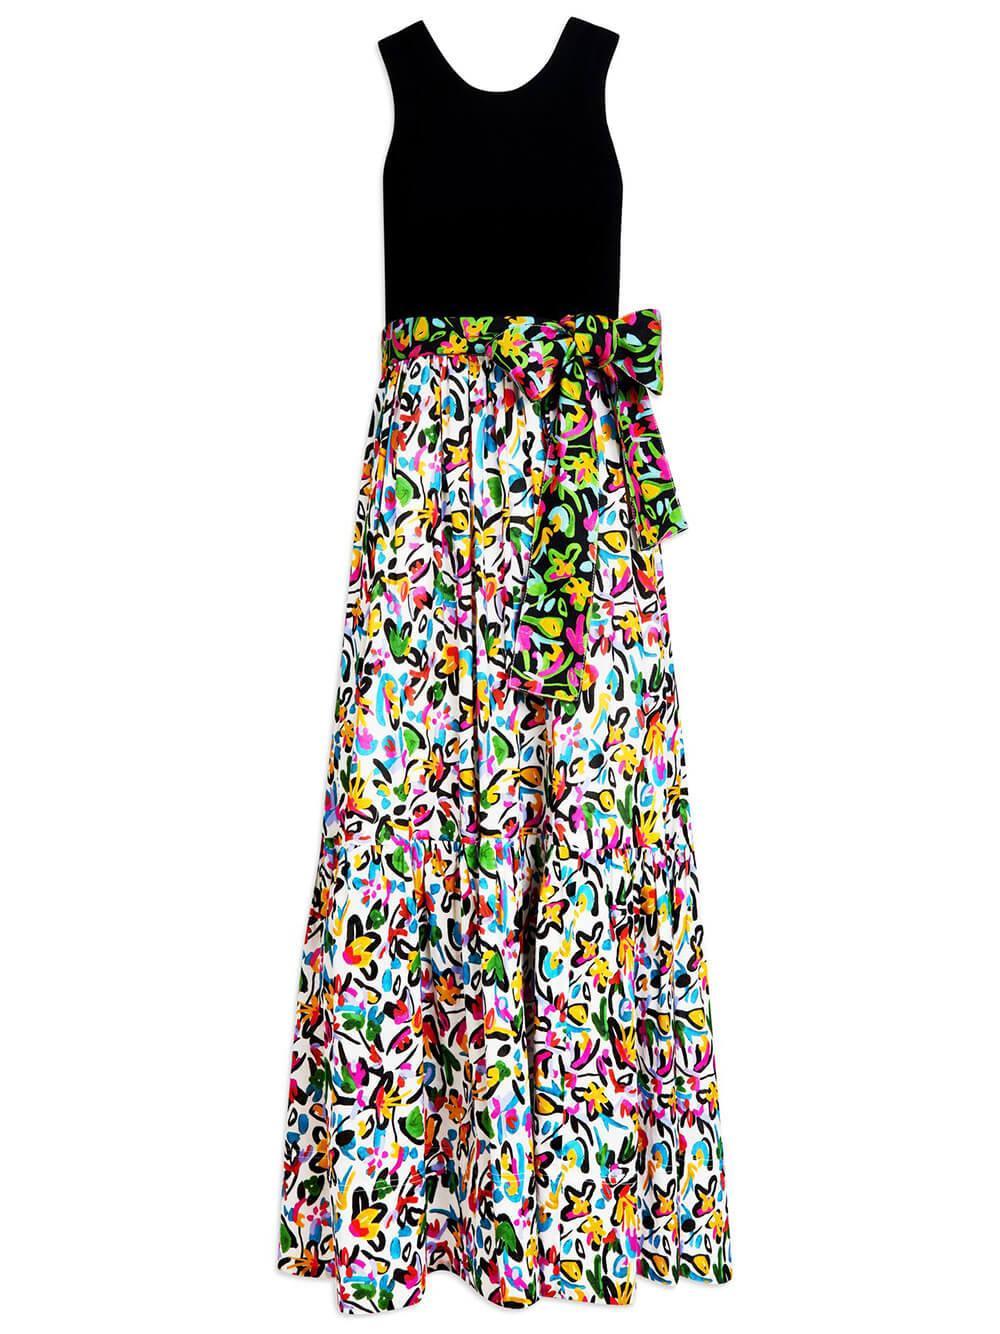 Genevive Painterly Printed Dress Item # U21D196229